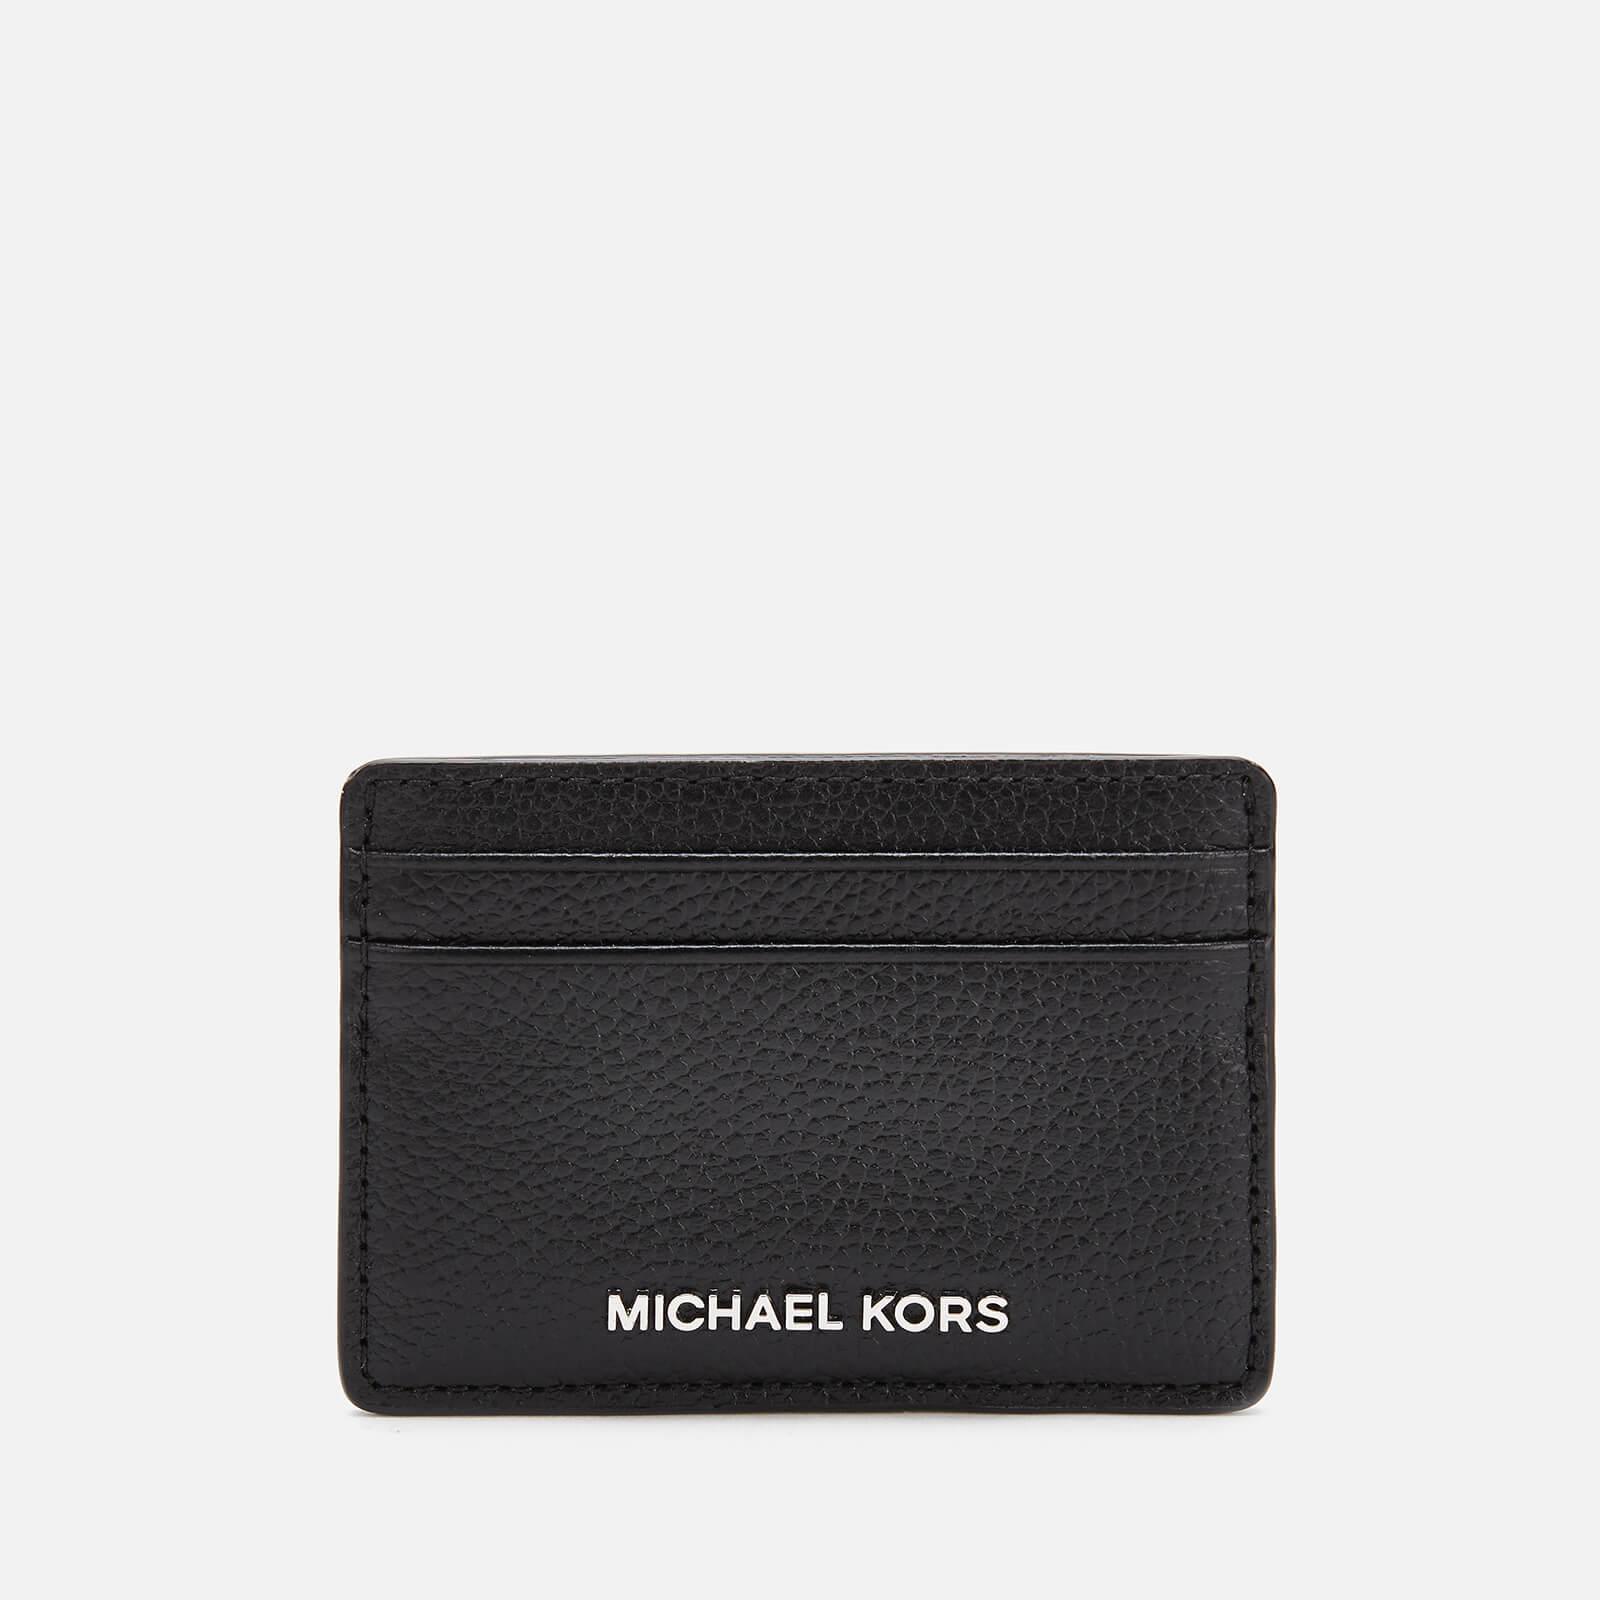 MICHAEL MICHAEL KORS Women's Money Pieces Card Holder - Black